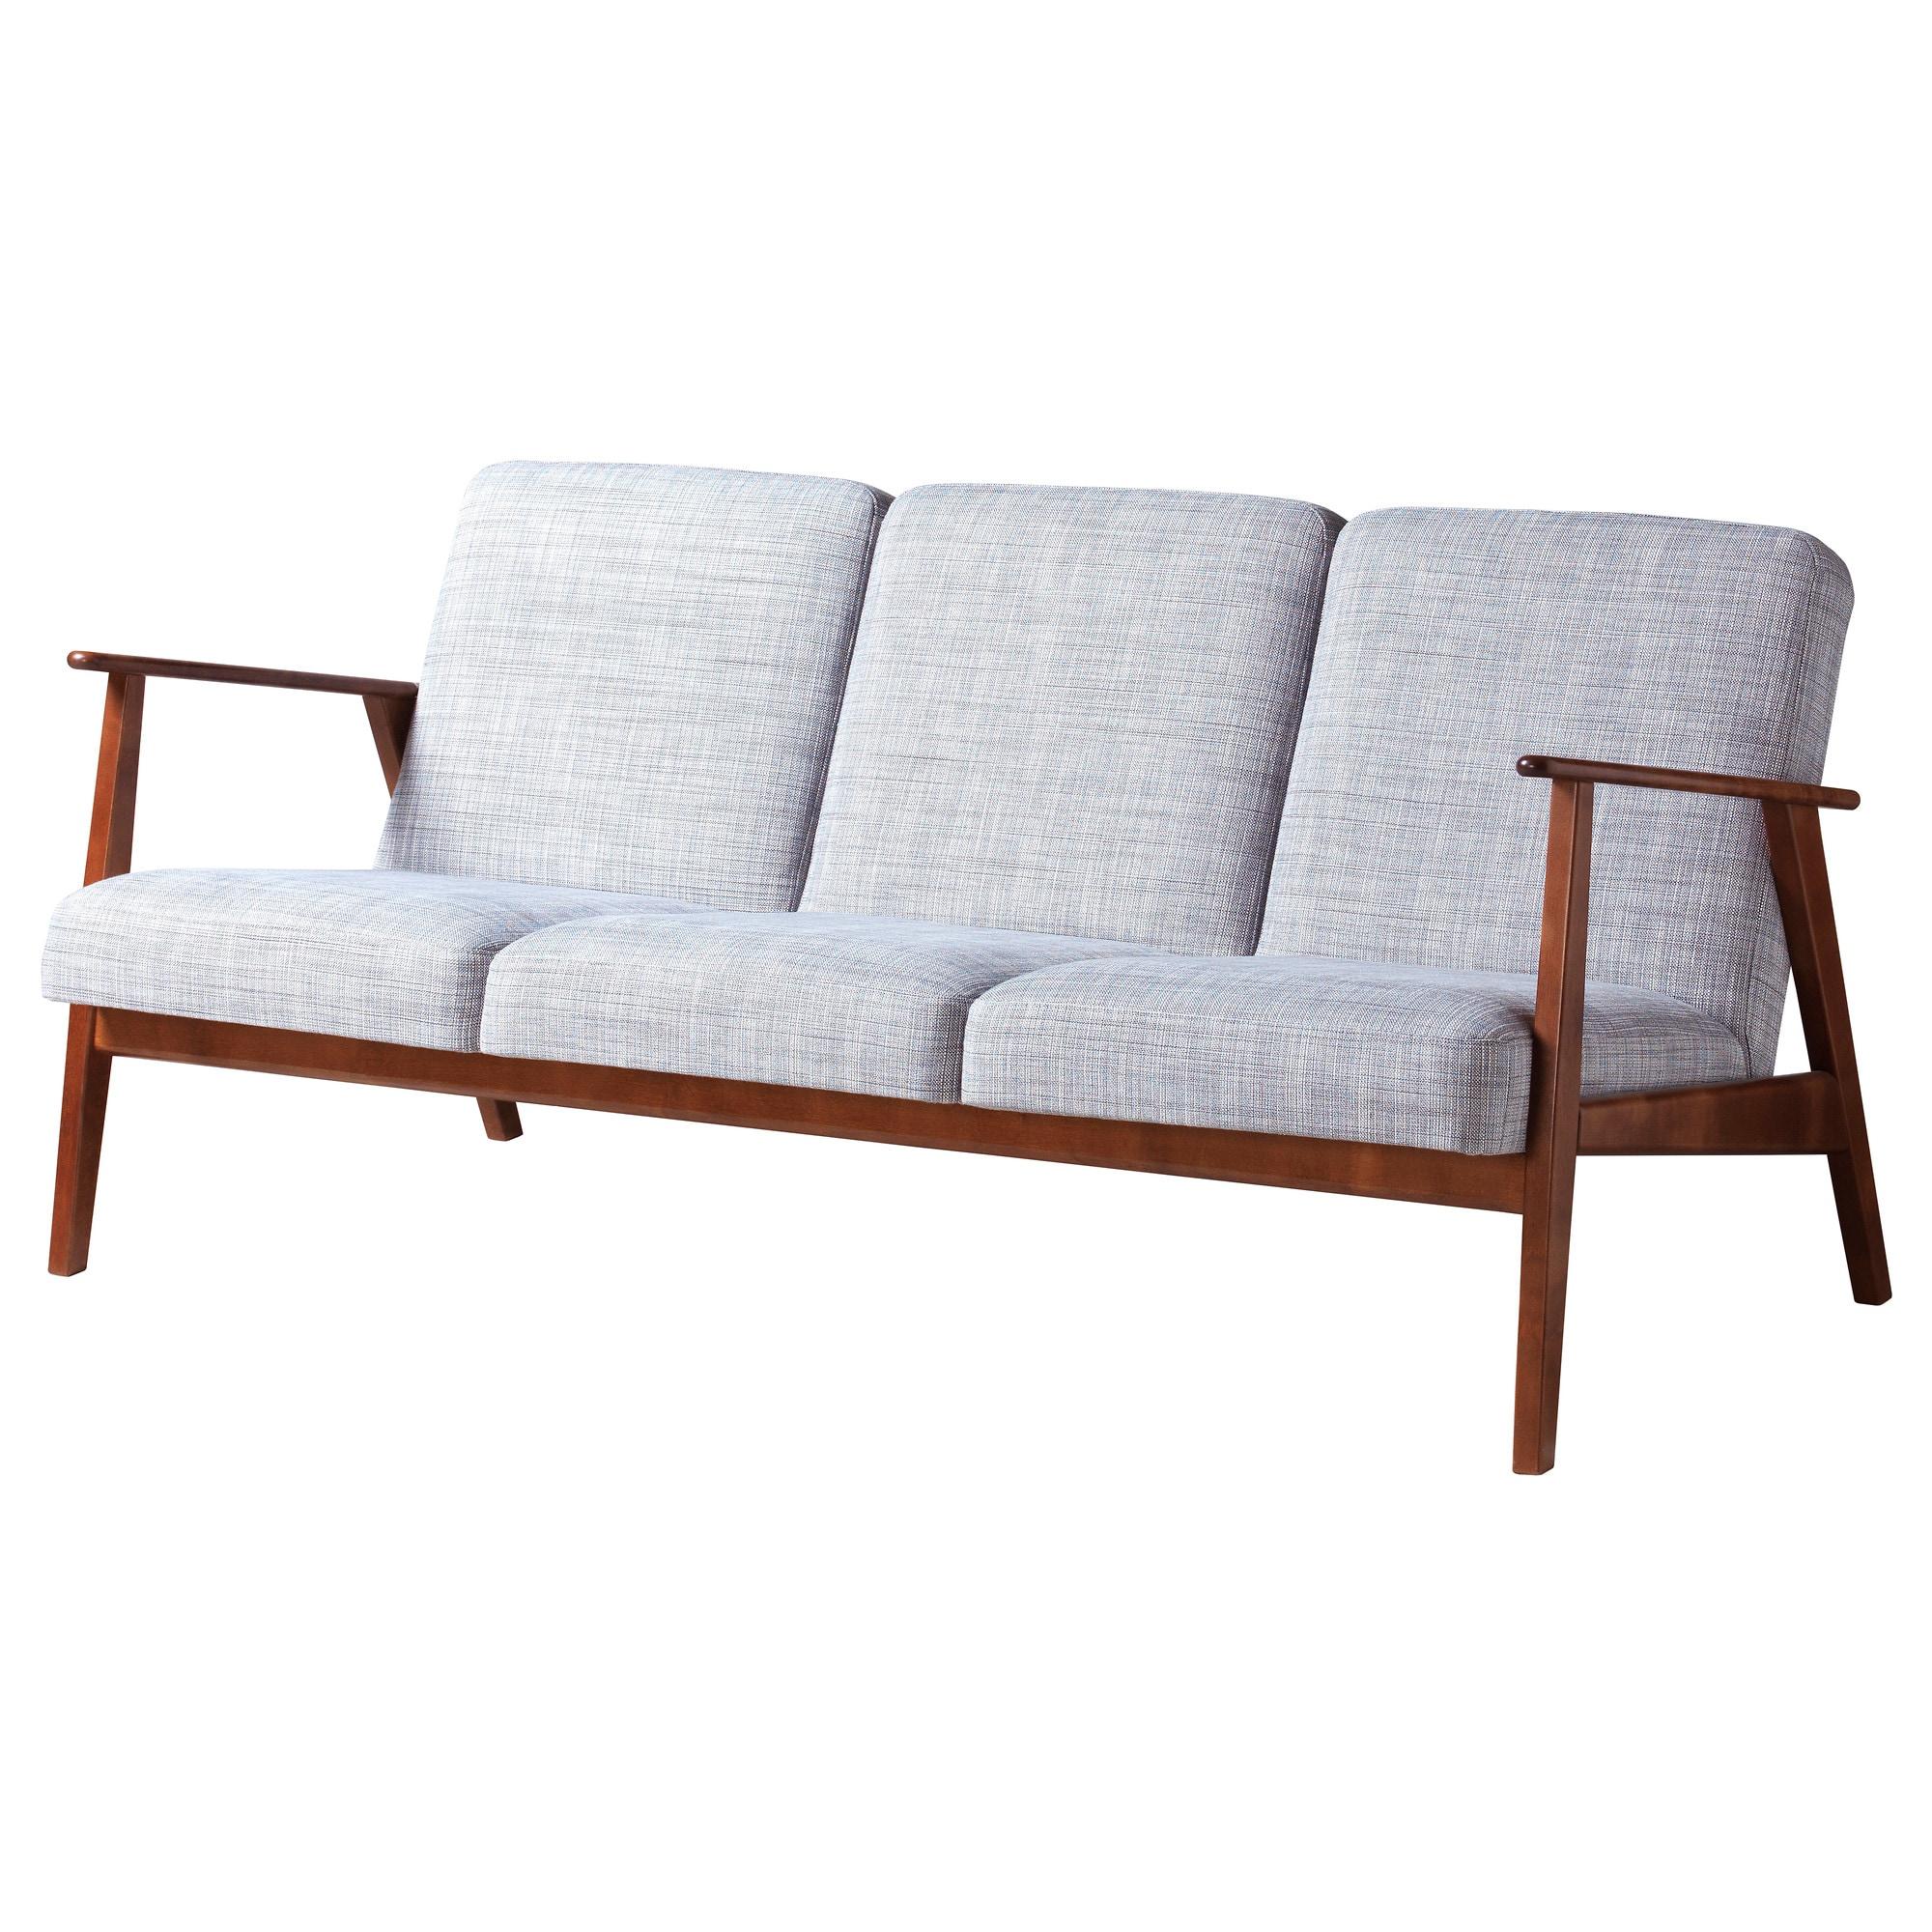 Ikea Holmsund Sofa Bed Nordvalla Medium Gray In 2020 Ikea Sofa